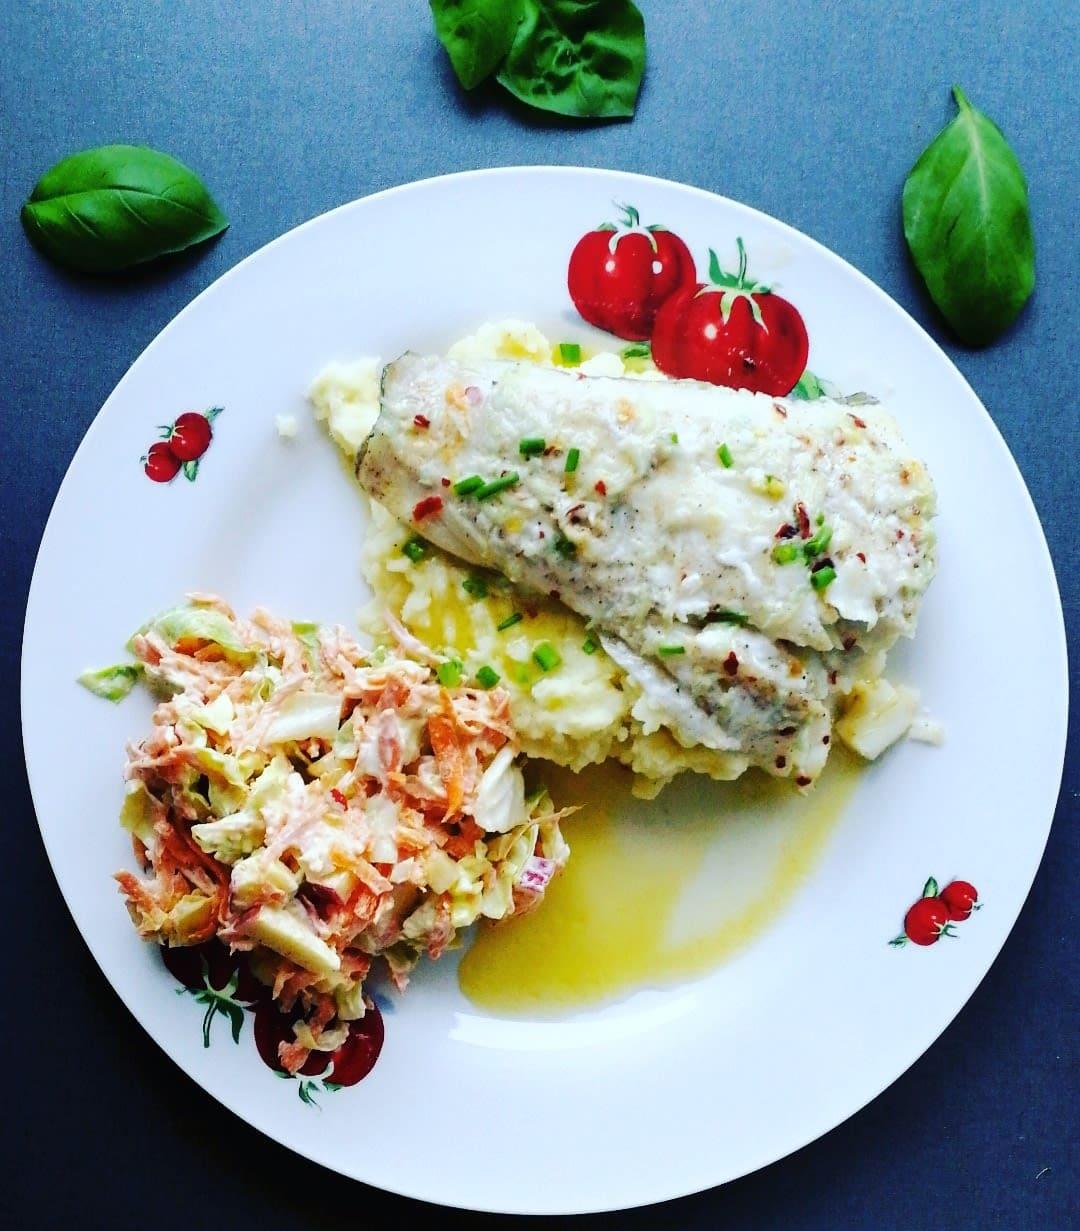 Torsk med potetstappe, sitronsaus og coleslaw